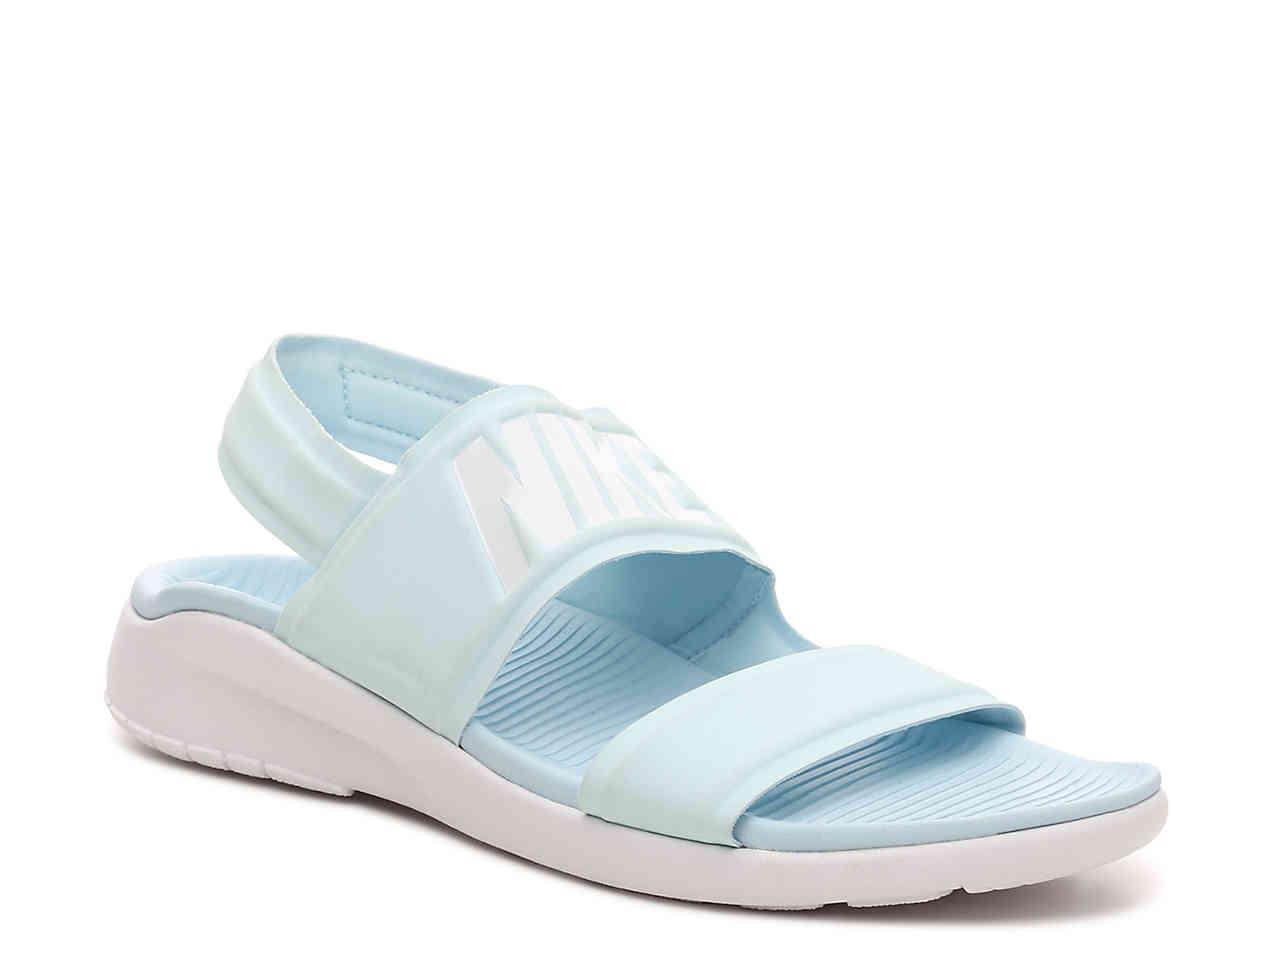 hot sale online ec86c 5c517 inexpensive nike sandals kawa slide sandals 6956e cf2a5  usa lyst nike  tanjun sport sandal in blue 252ba 13507